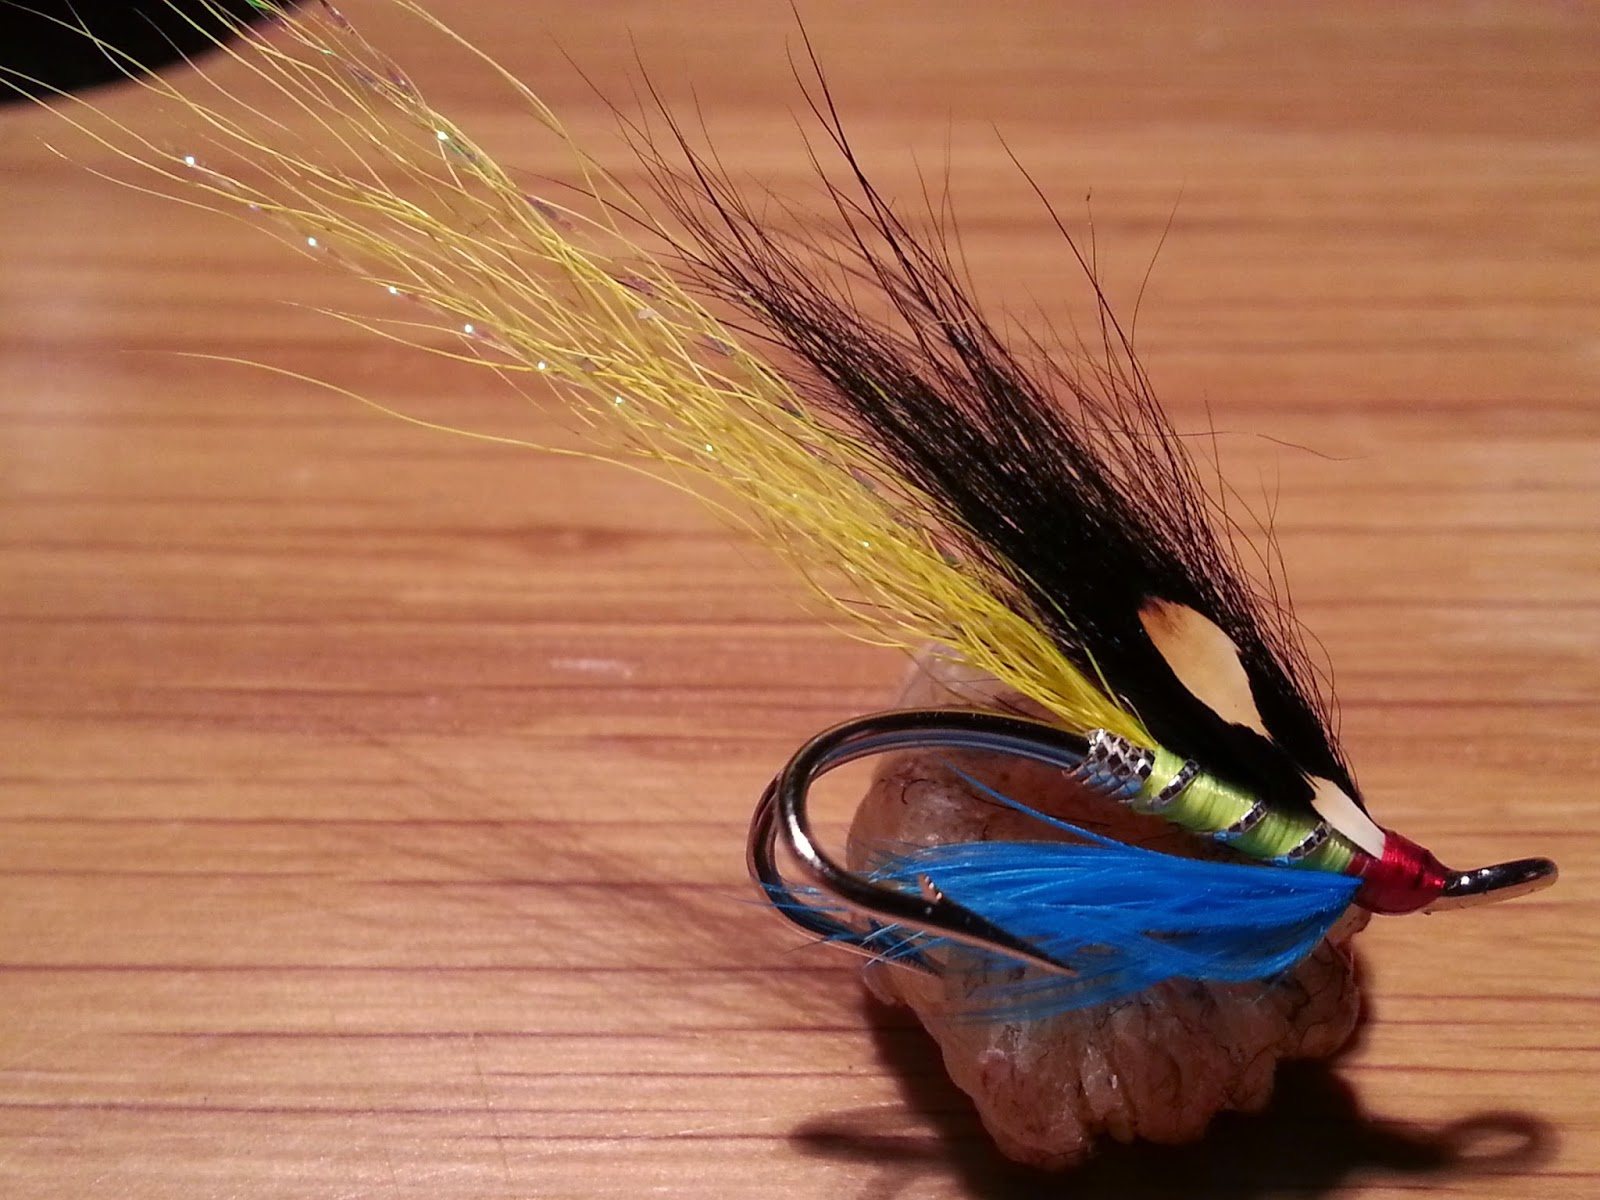 Salmon fly scottish salmon flies tay salmon fly for Salon fly